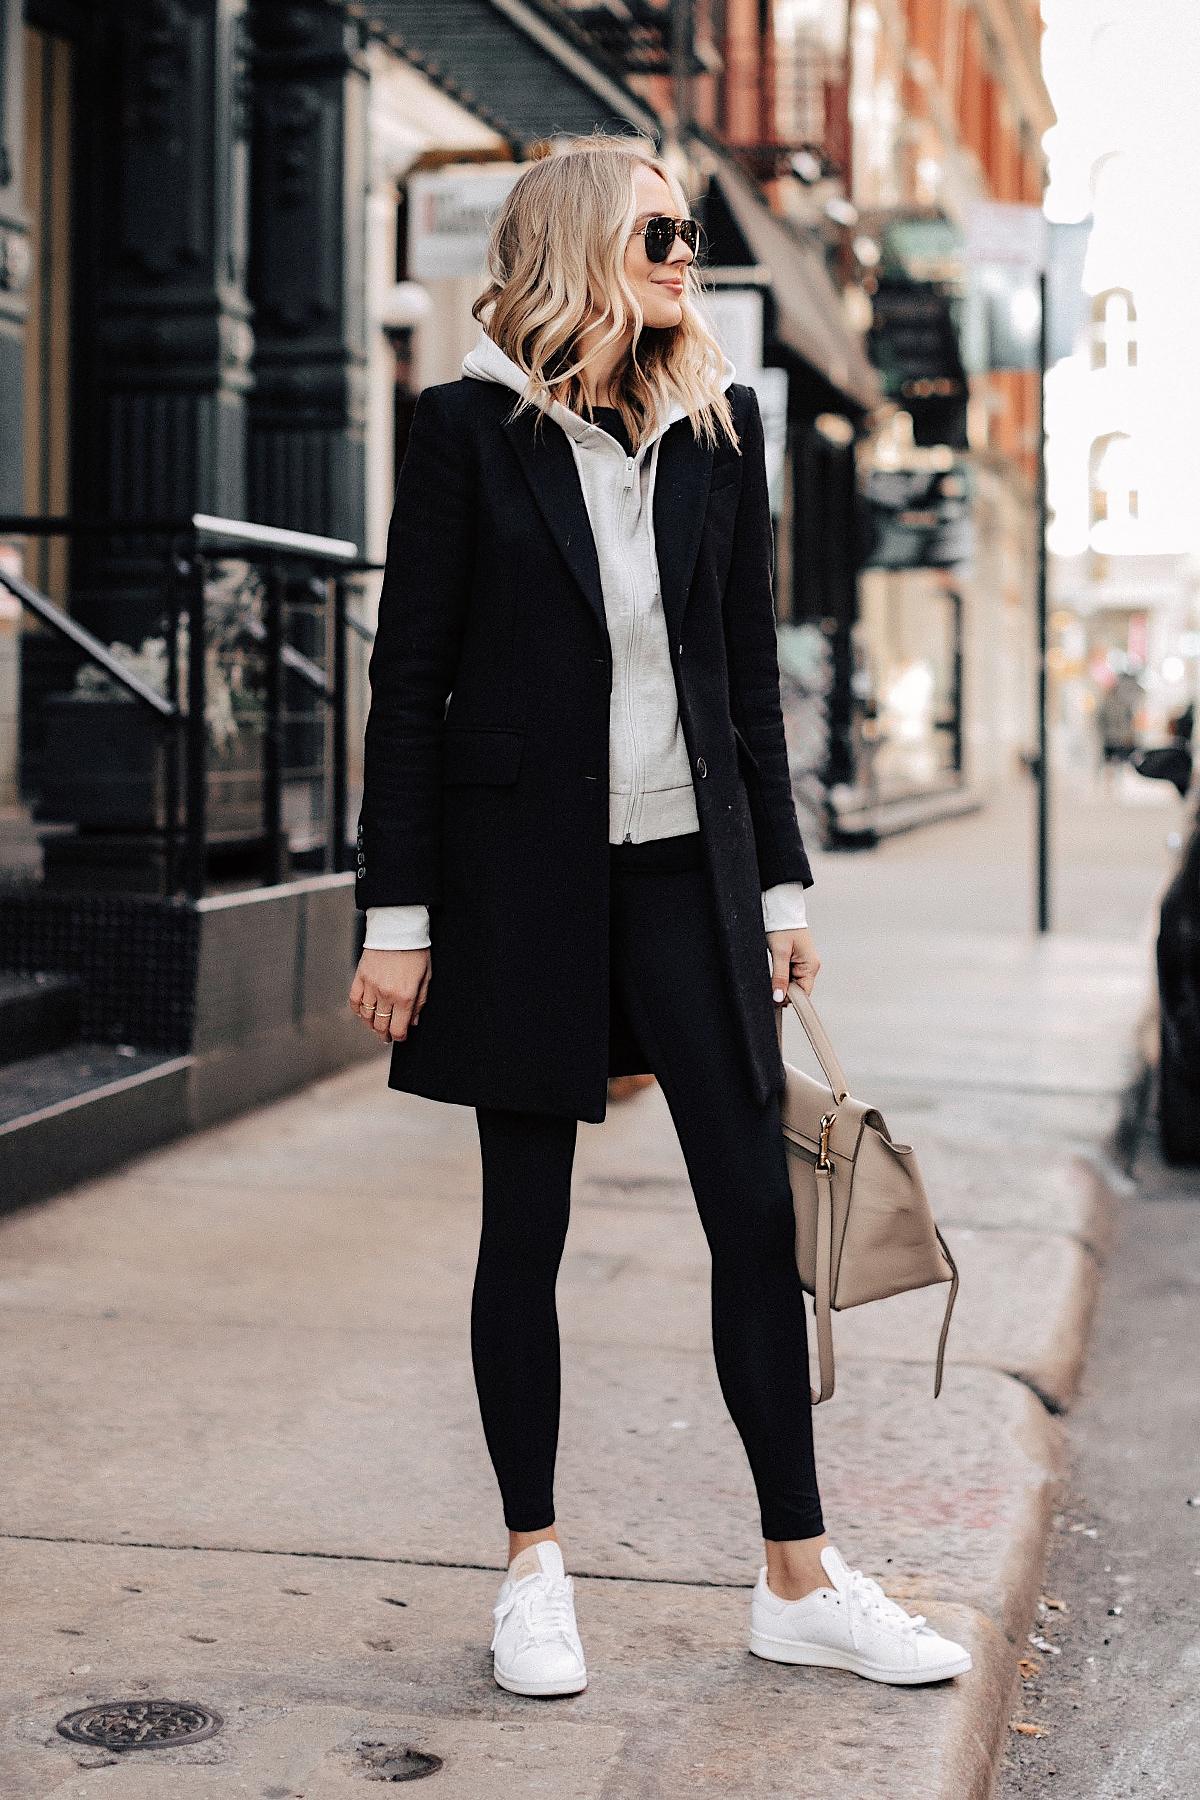 Fashion Jackson Wearing Black Wool Coat Grey Hoodie Black Leggings adidas white Stan Smith Sneakers NYC Street Style 2